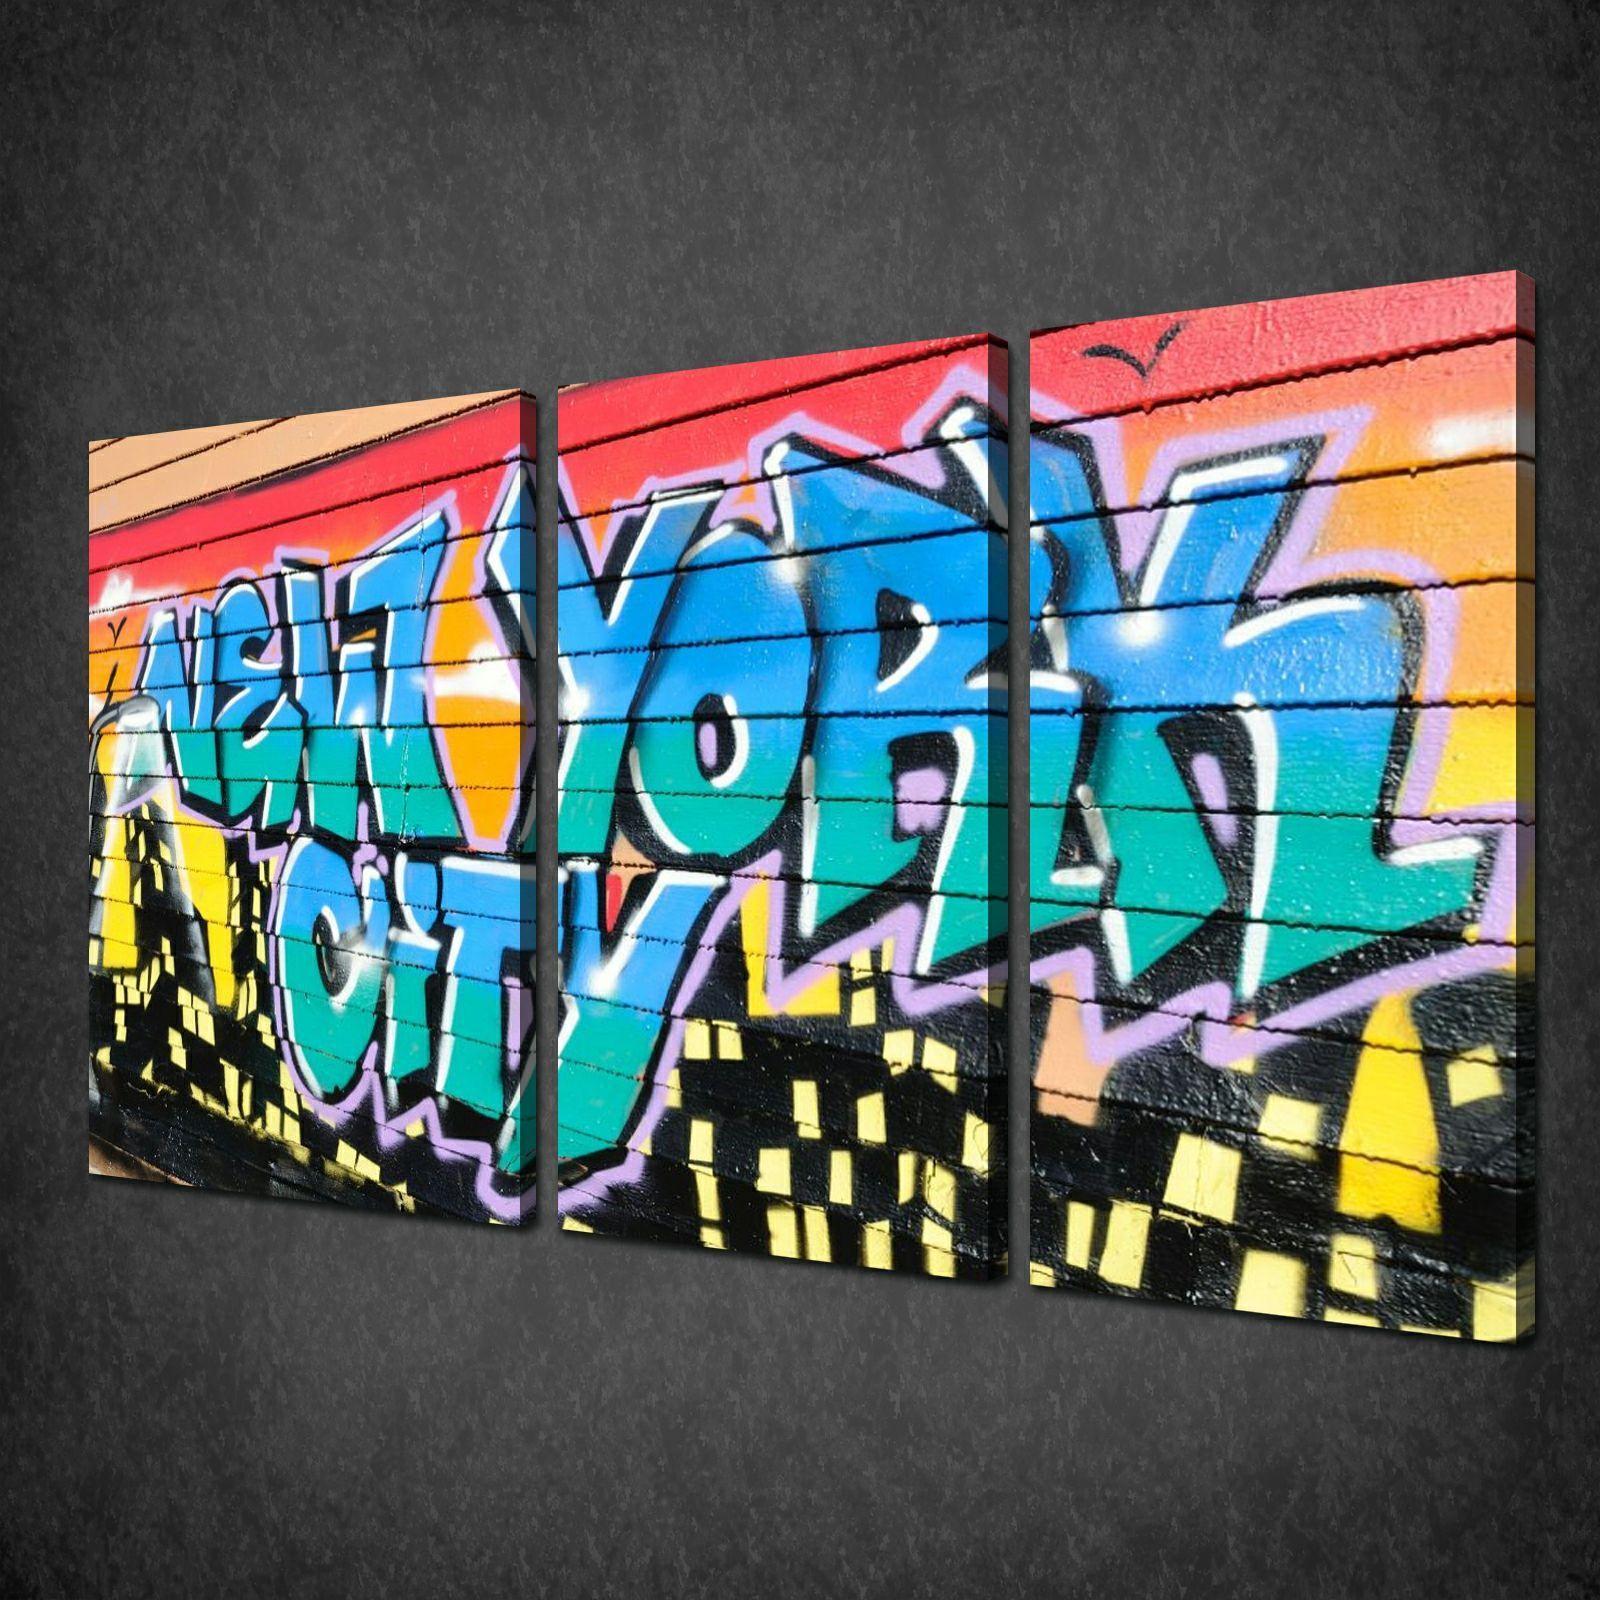 New york city graffiti 3 panels canvas